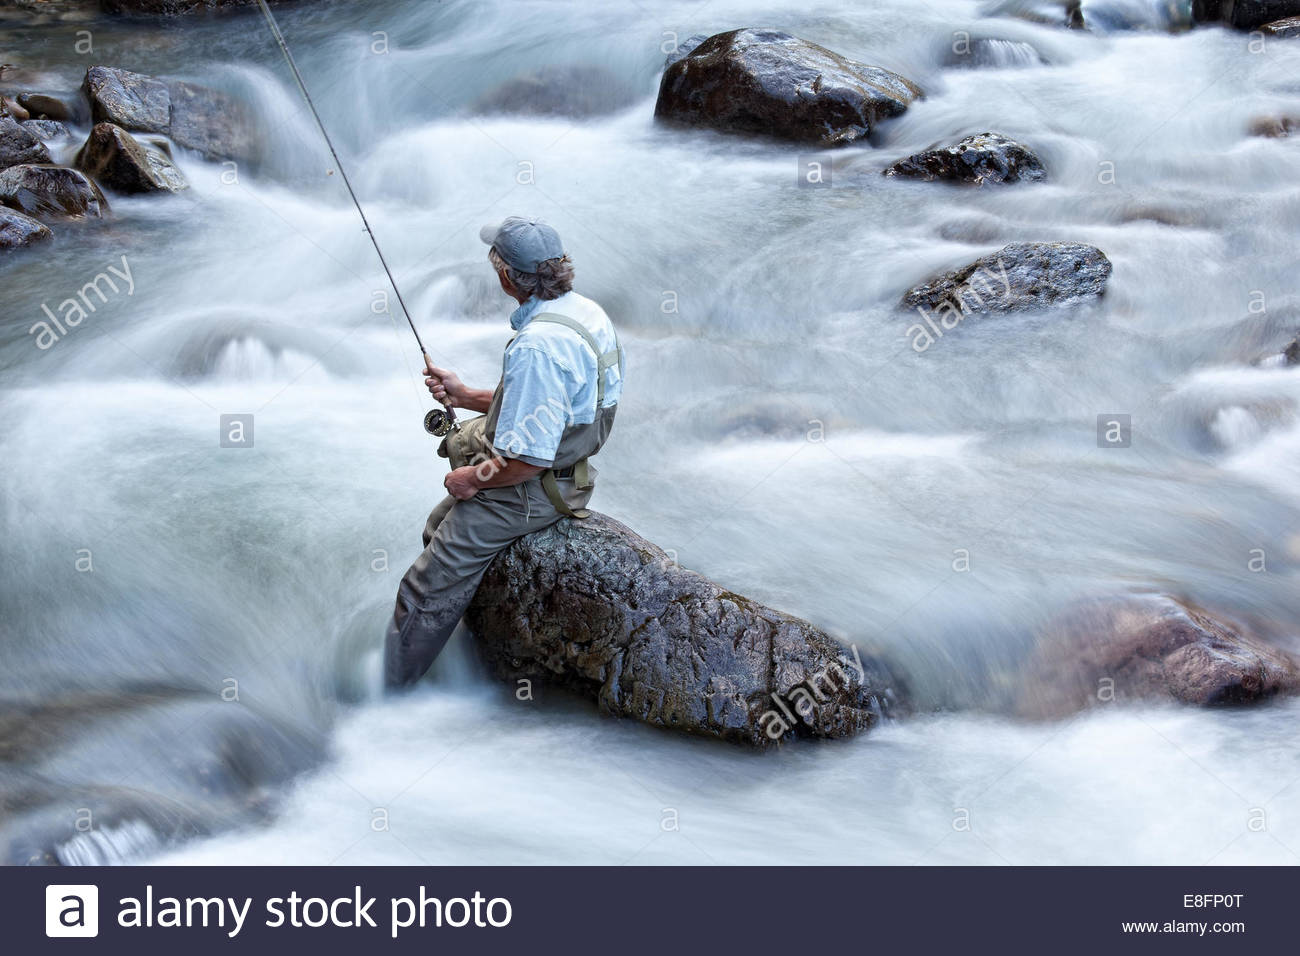 USA, Colorado, Hinsdale County, Lake City, Fisherman sitting on boulder - Stock Image